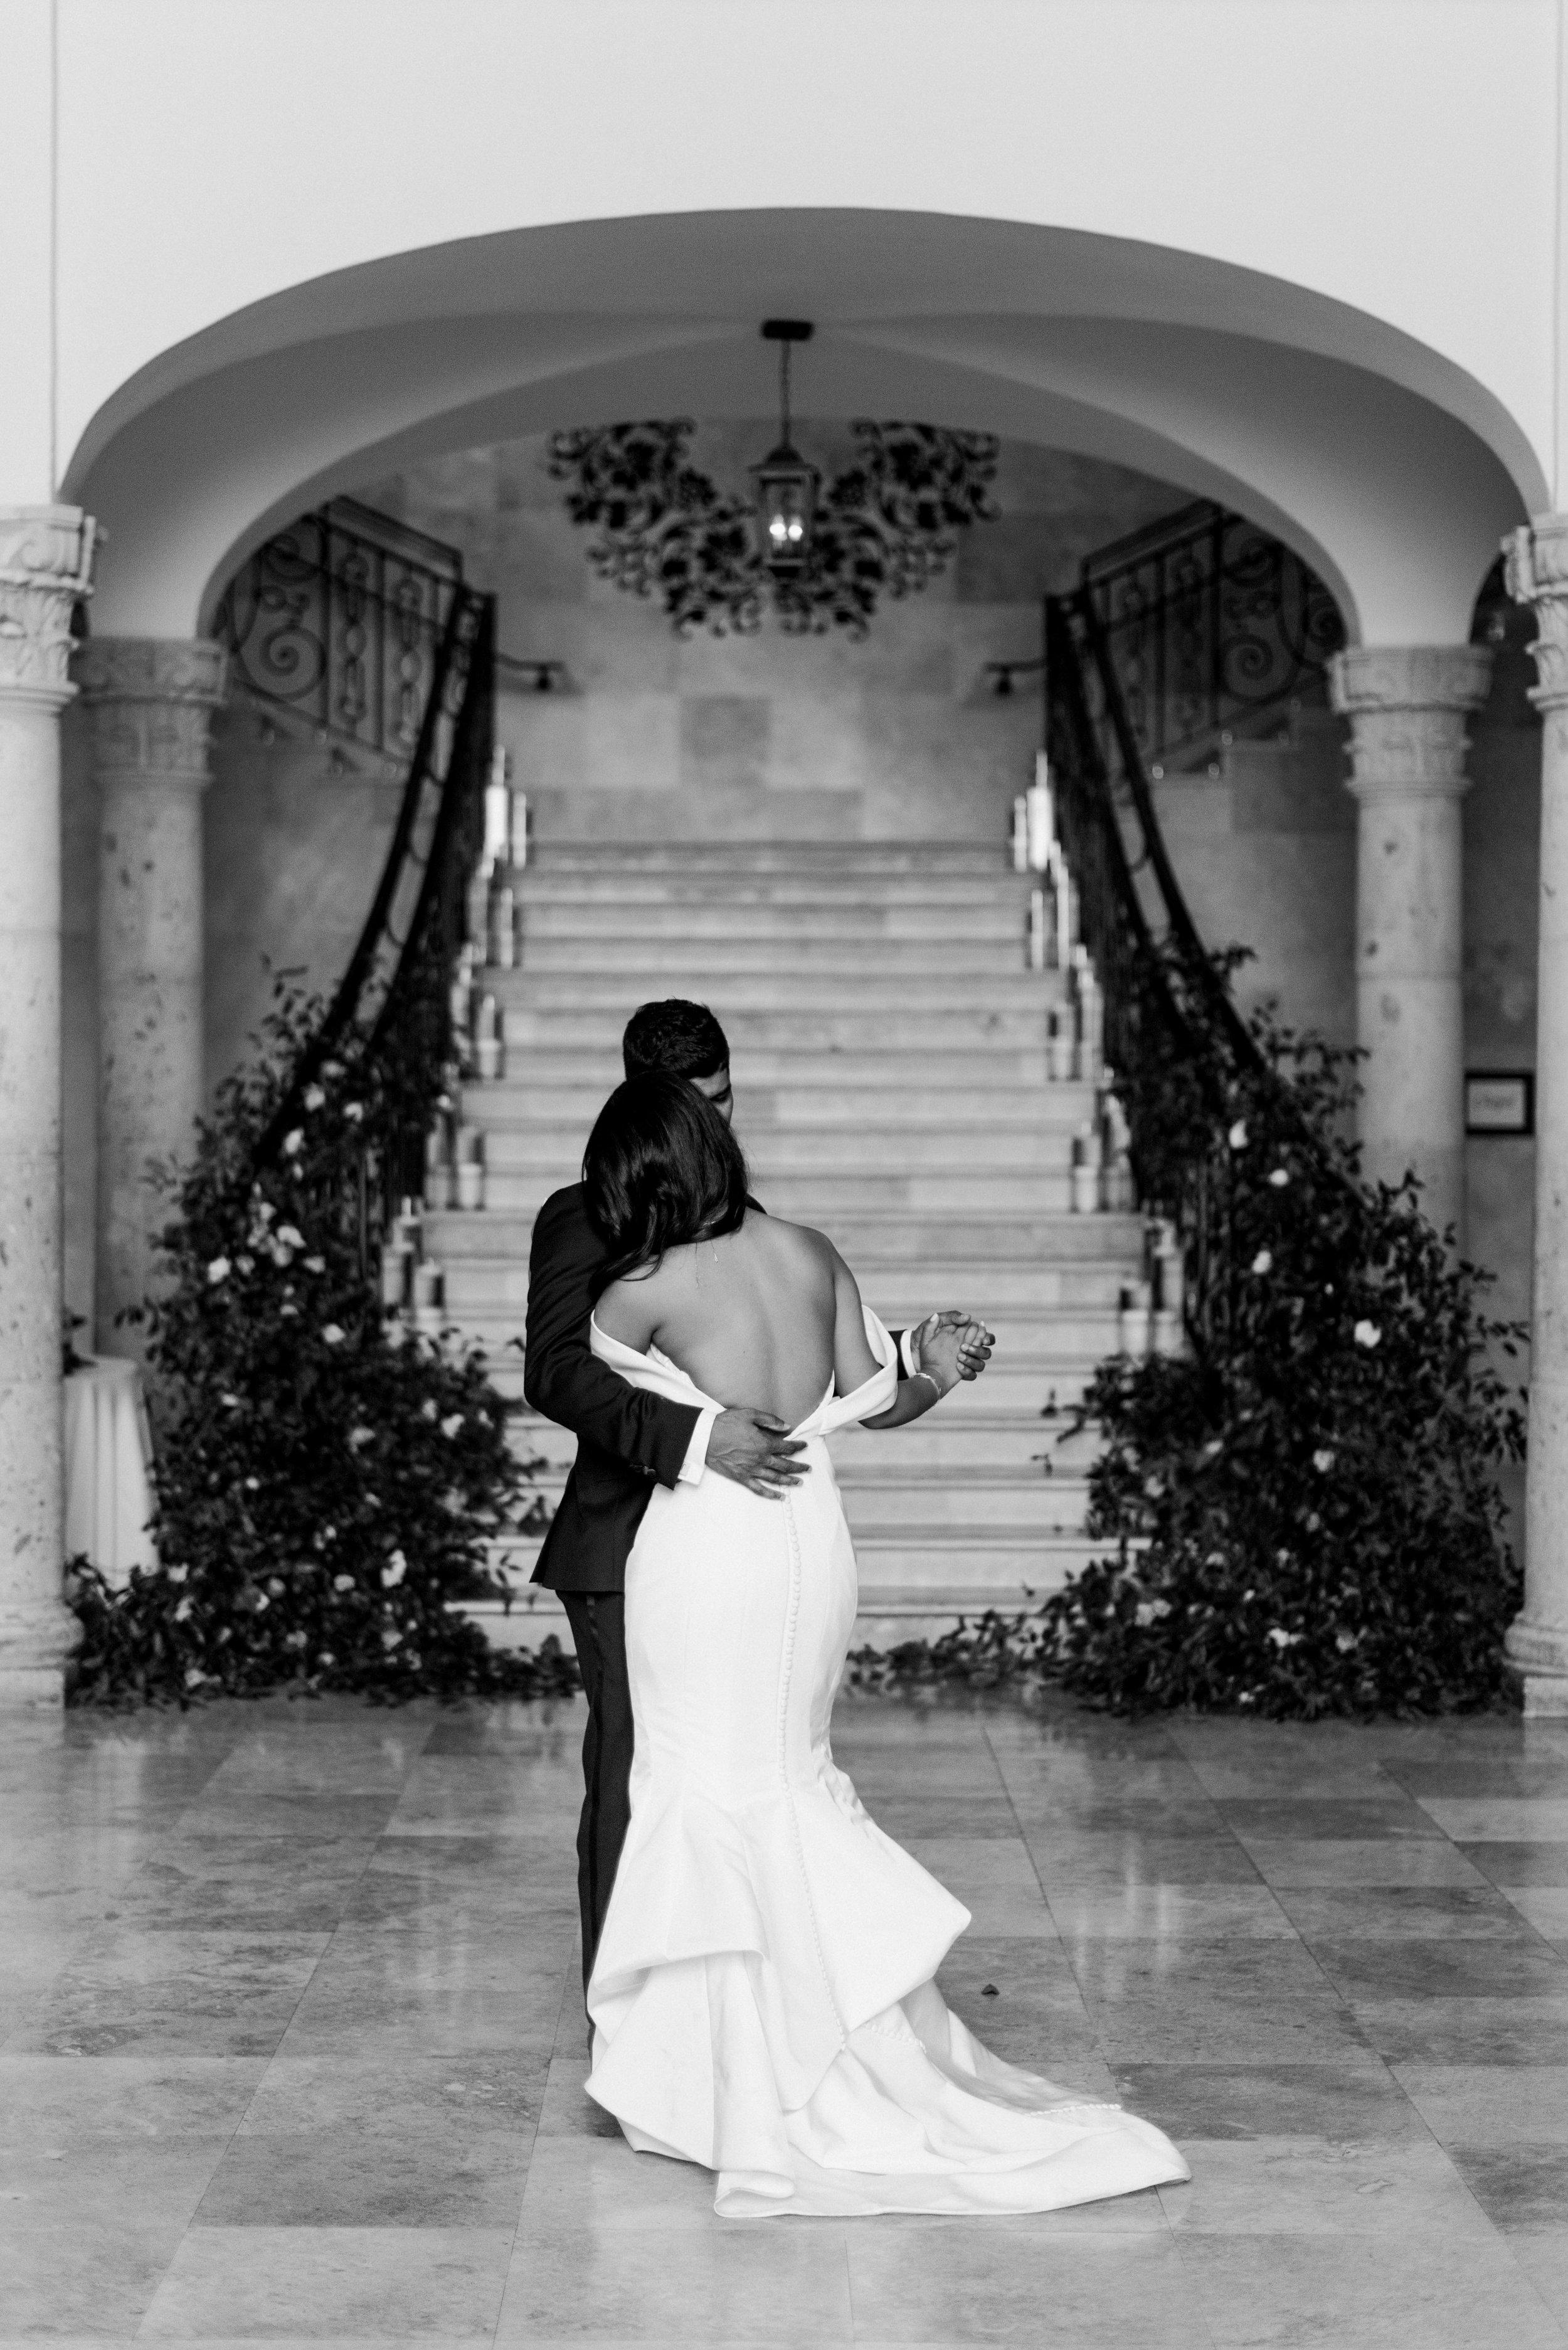 Fine-Art-Film-Houston-Wedding-Photographer-Best-Top-Luxury-Texas-Austin-Dallas-Destination-Dana-Fernandez-Photography-The-Bell-Tower-on-34th-Indian-36.jpg